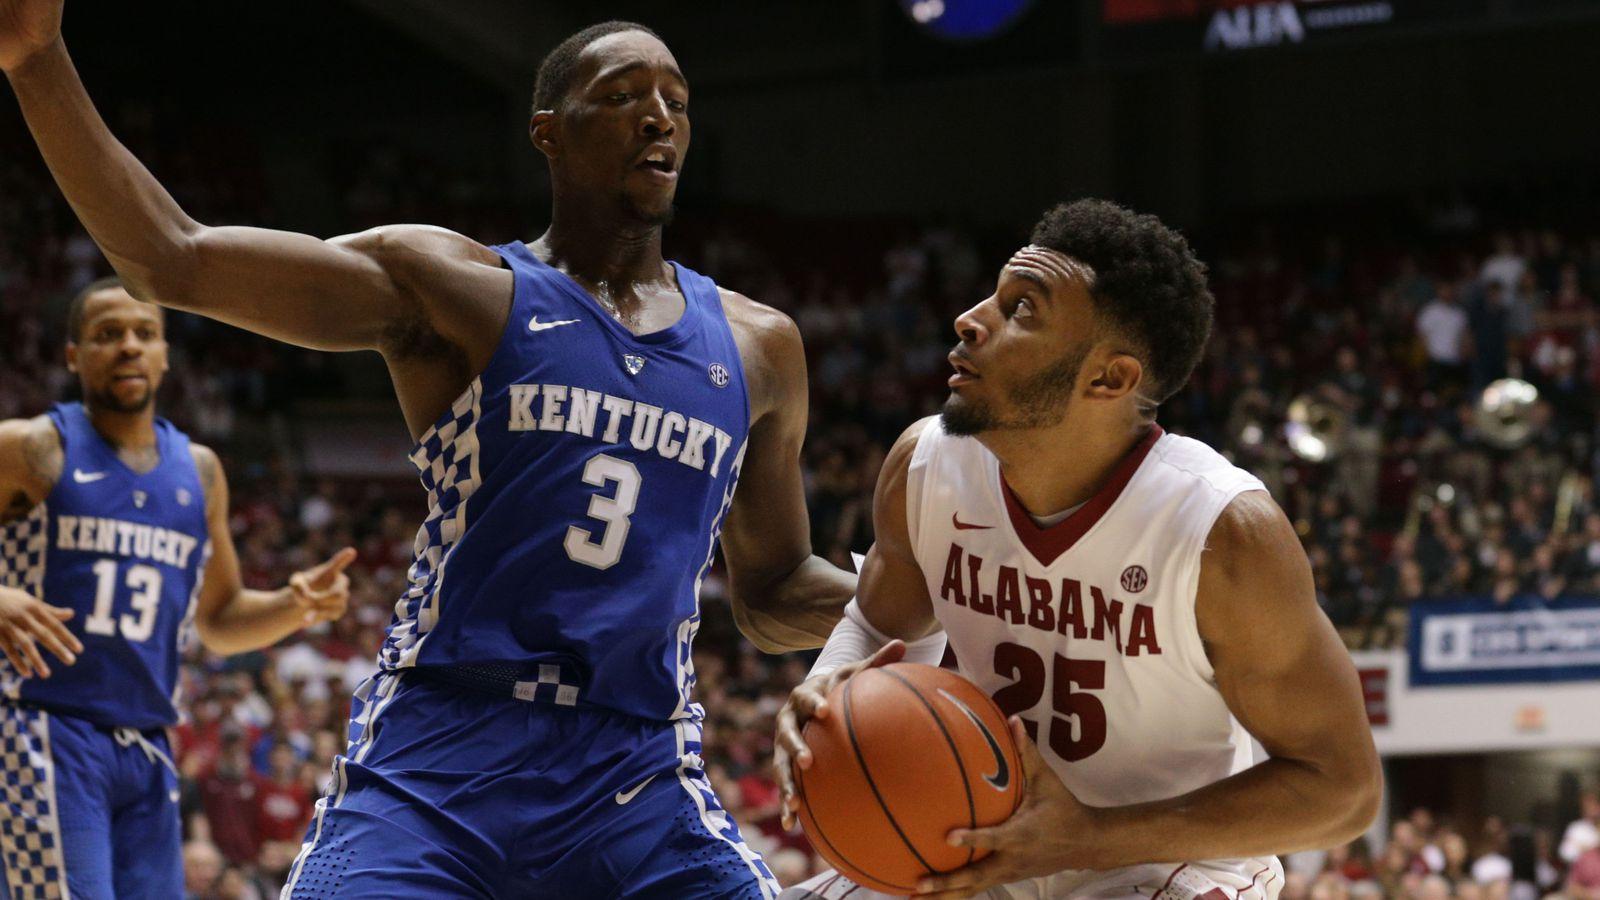 Kentucky Wildcats Basketball Vs Centre Game Time Tv: Kentucky Basketball Vs Alabama Crimson Tide: Game Time, TV